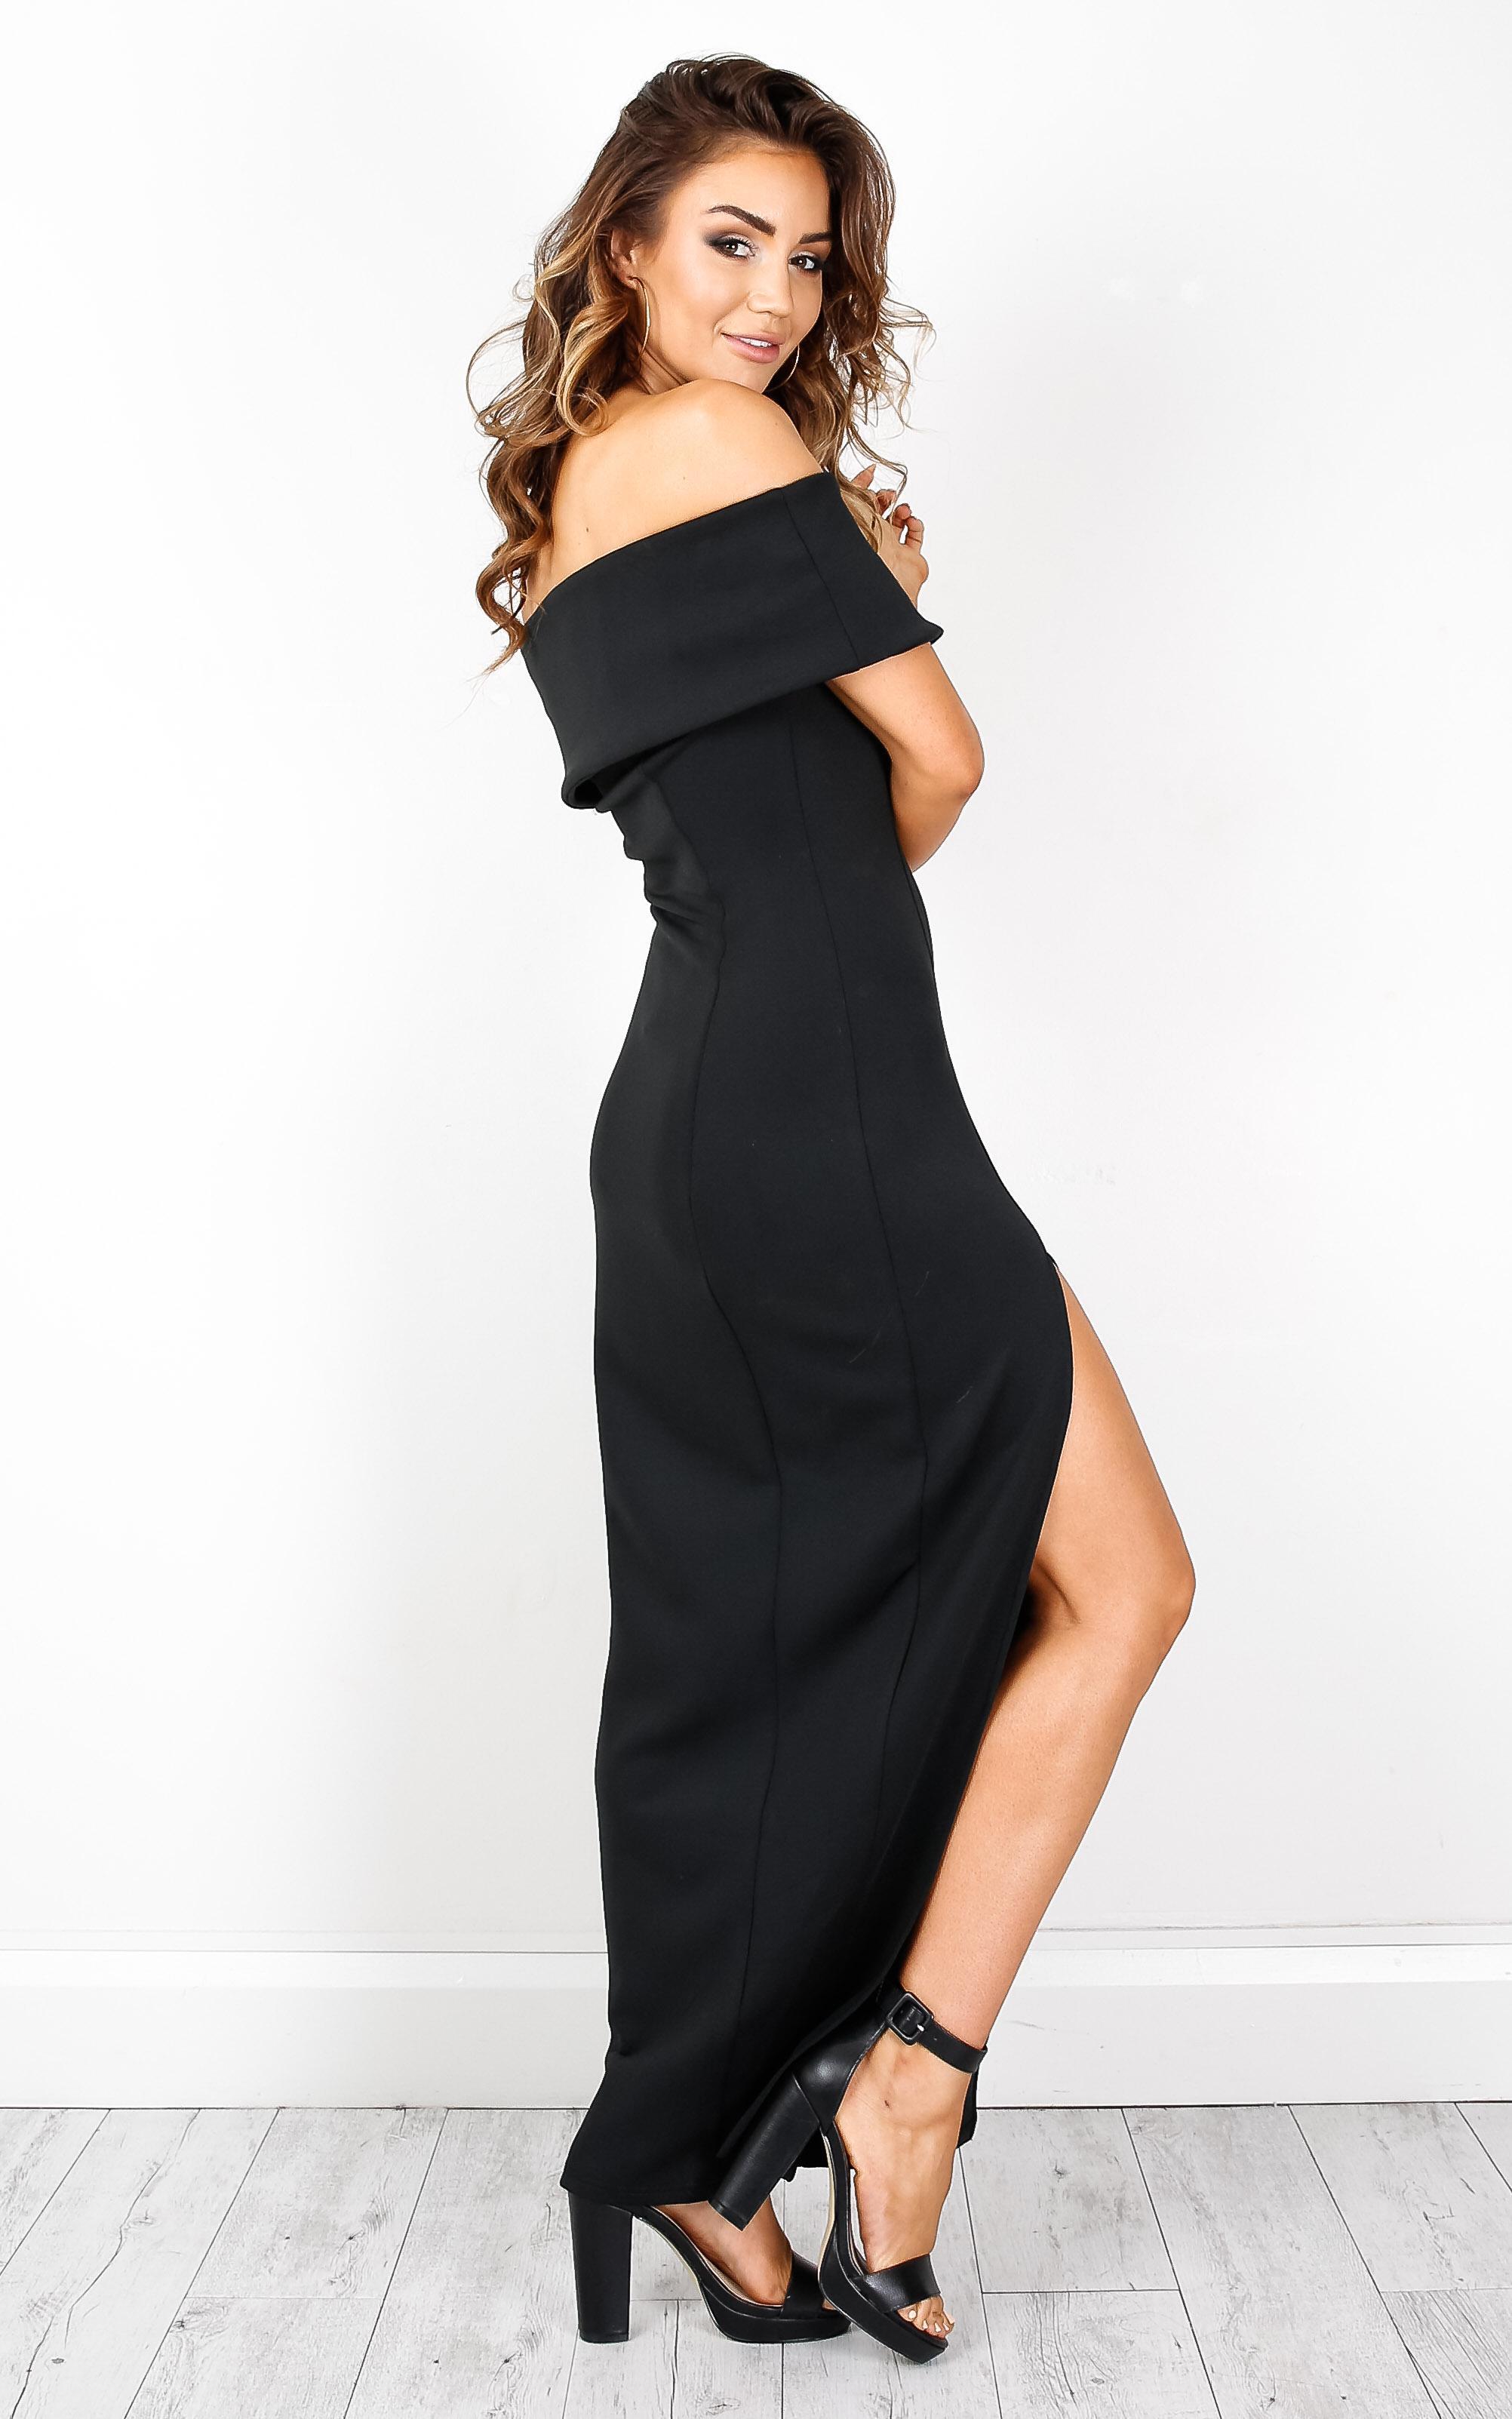 0f06a0848dc Lyst - Showpo Champagne Kisses Dress In Black in Black